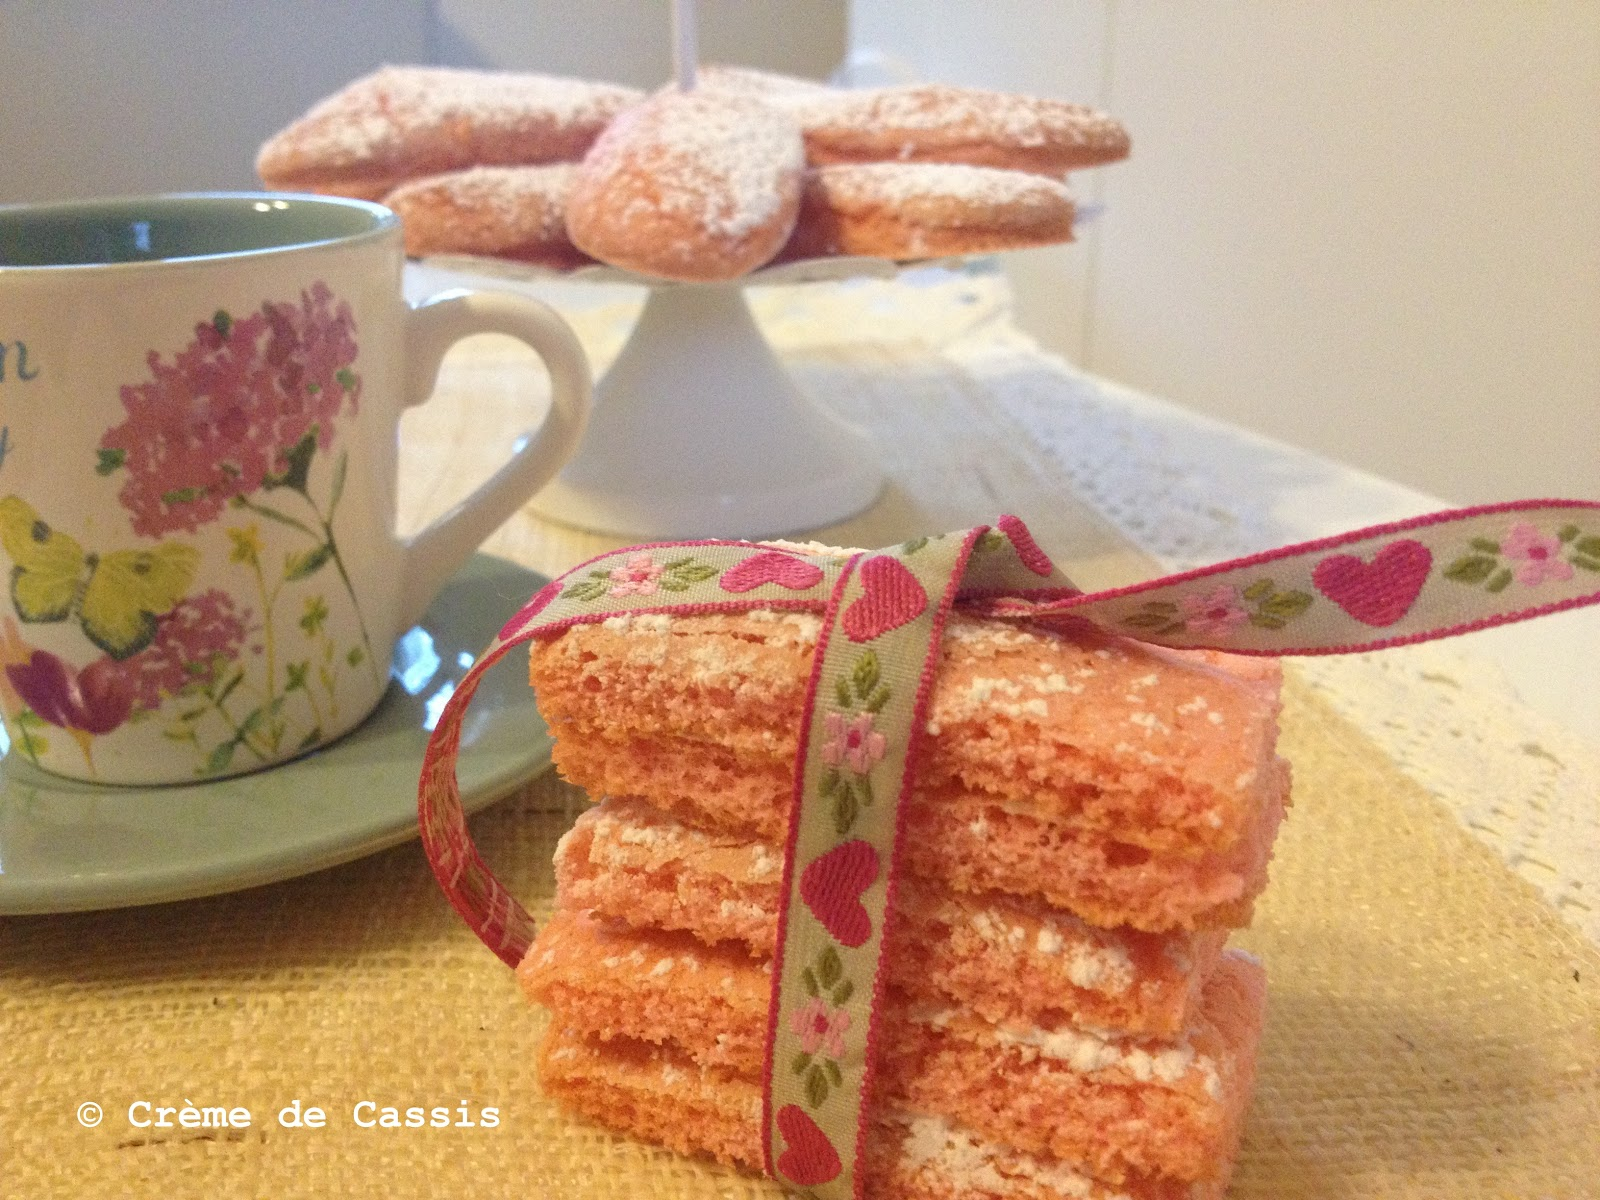 CrèmeDeCassis: Biscotti Rosa di Reims